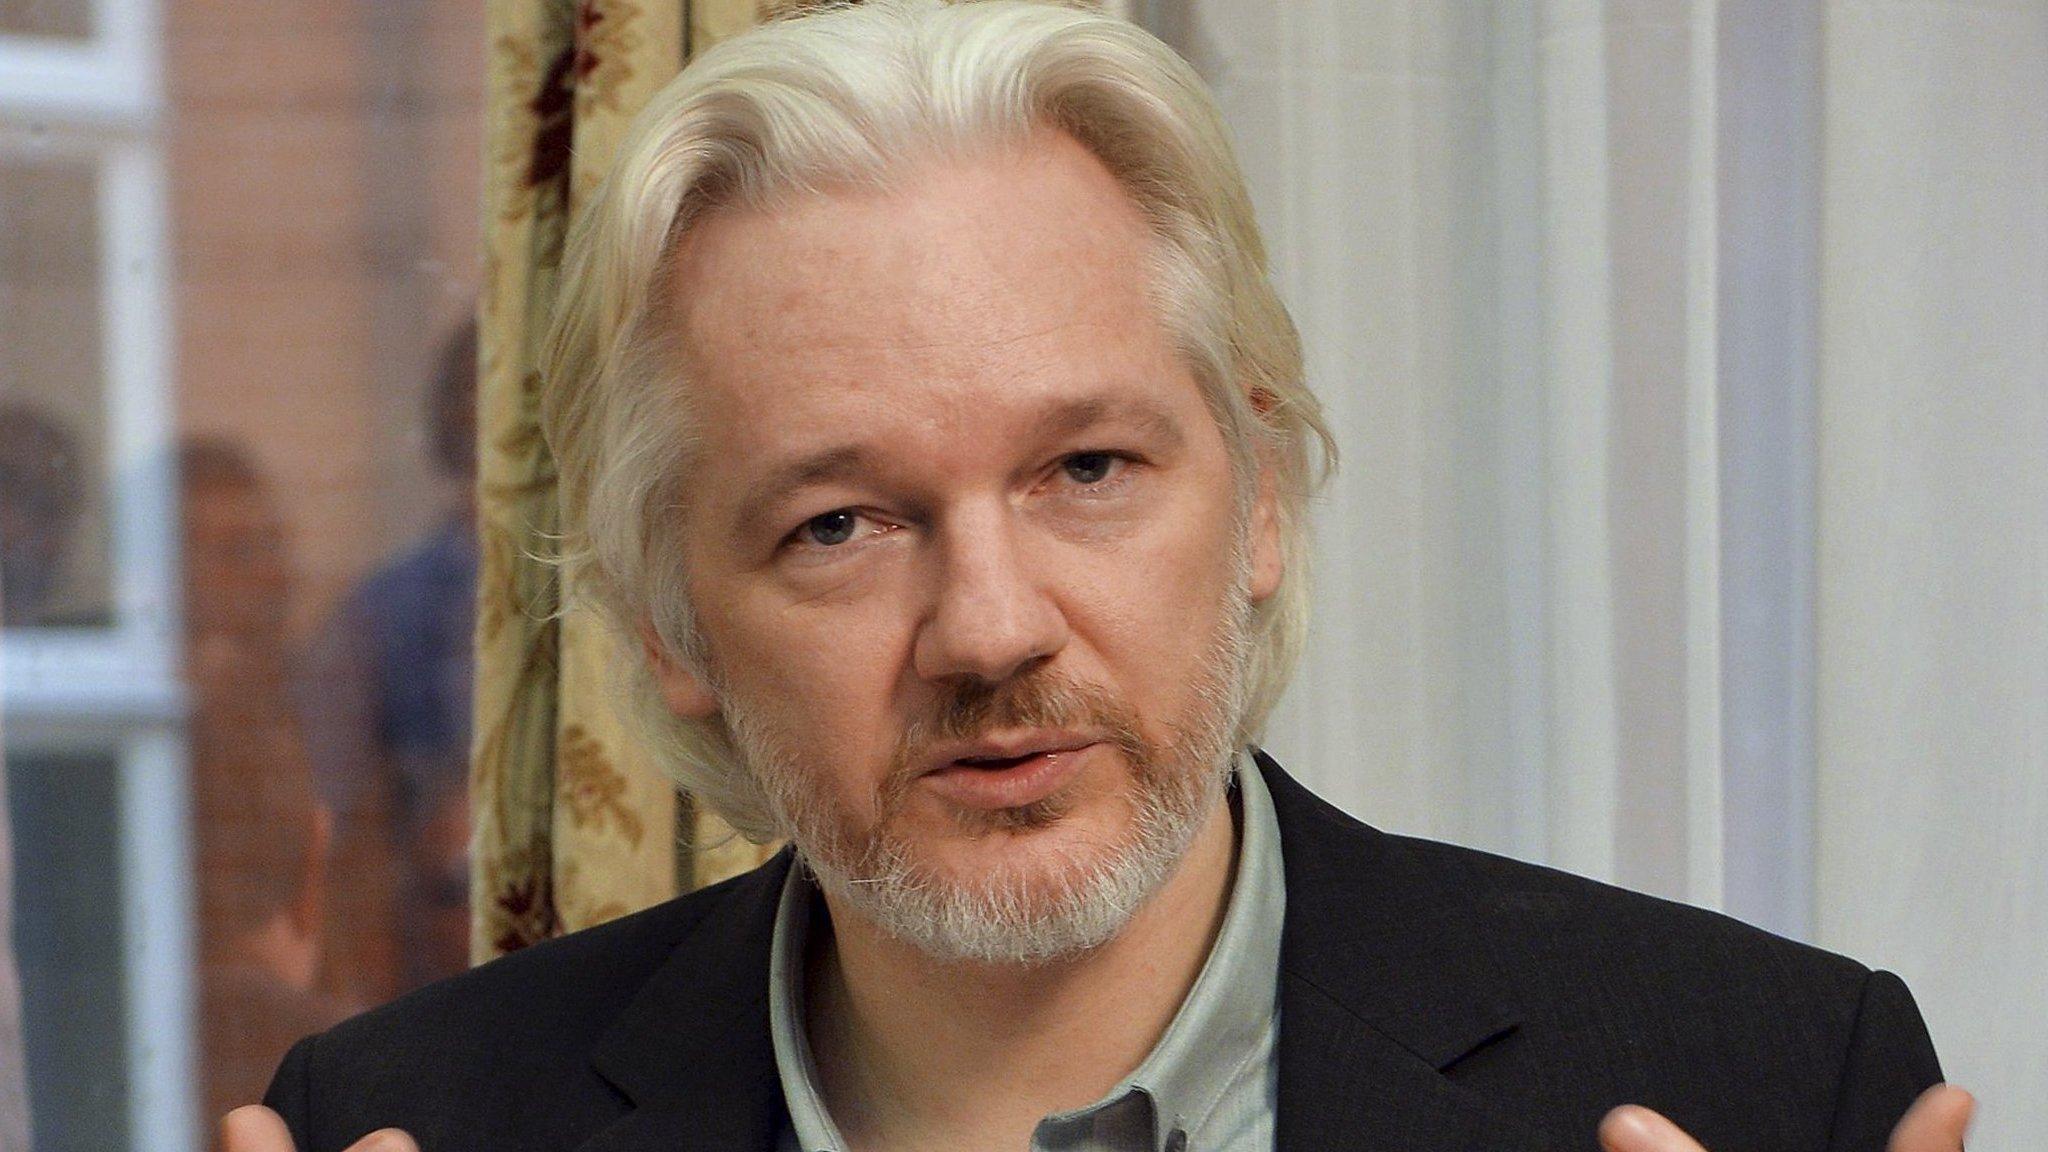 Wikileaks criticised on sensitive data